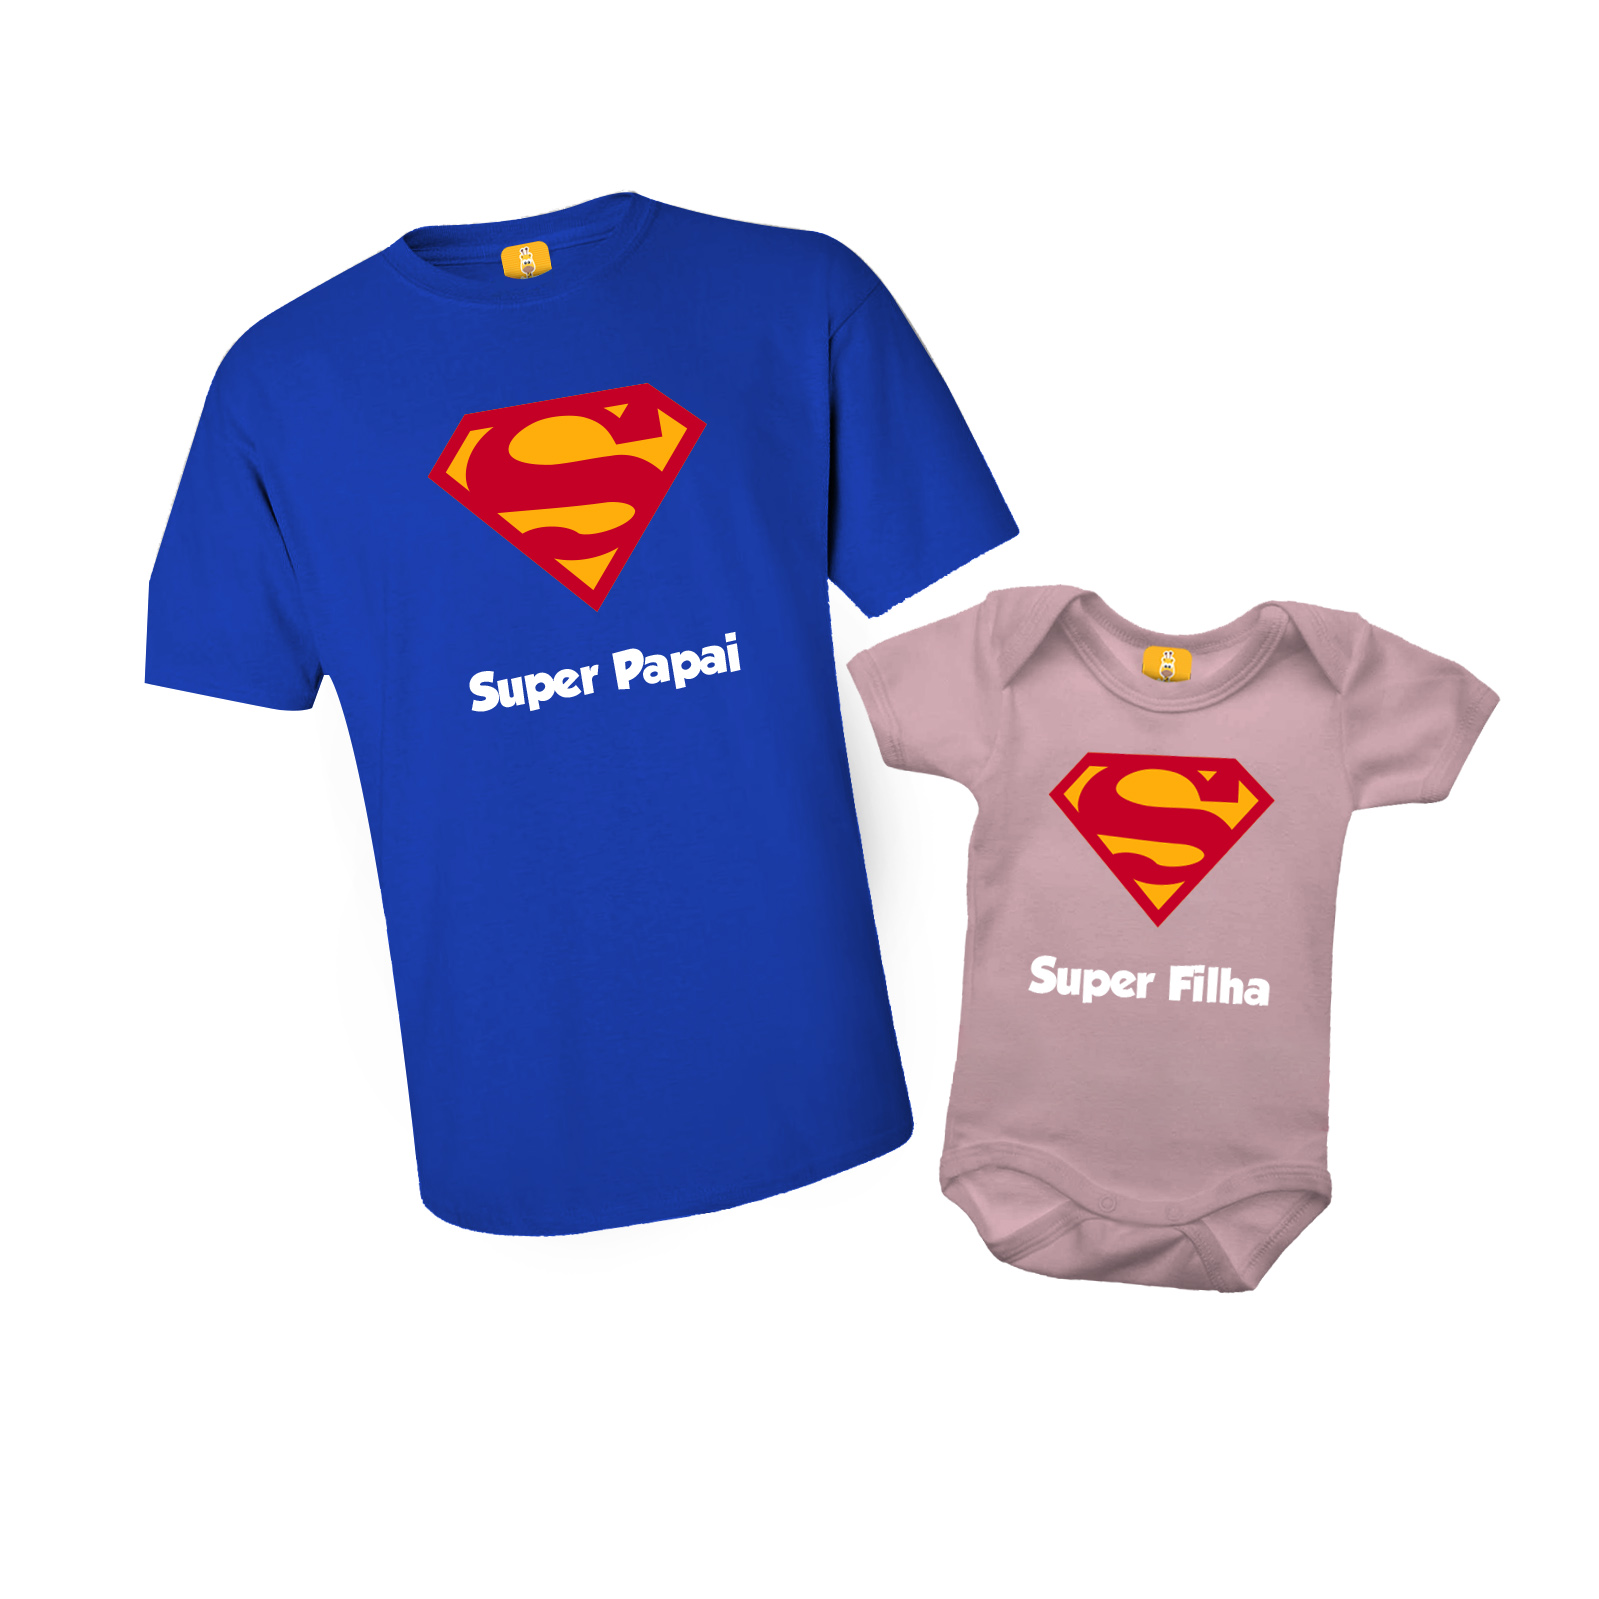 Kit Body e Camiseta - Super Papai e Super Filha - SUPERMAN